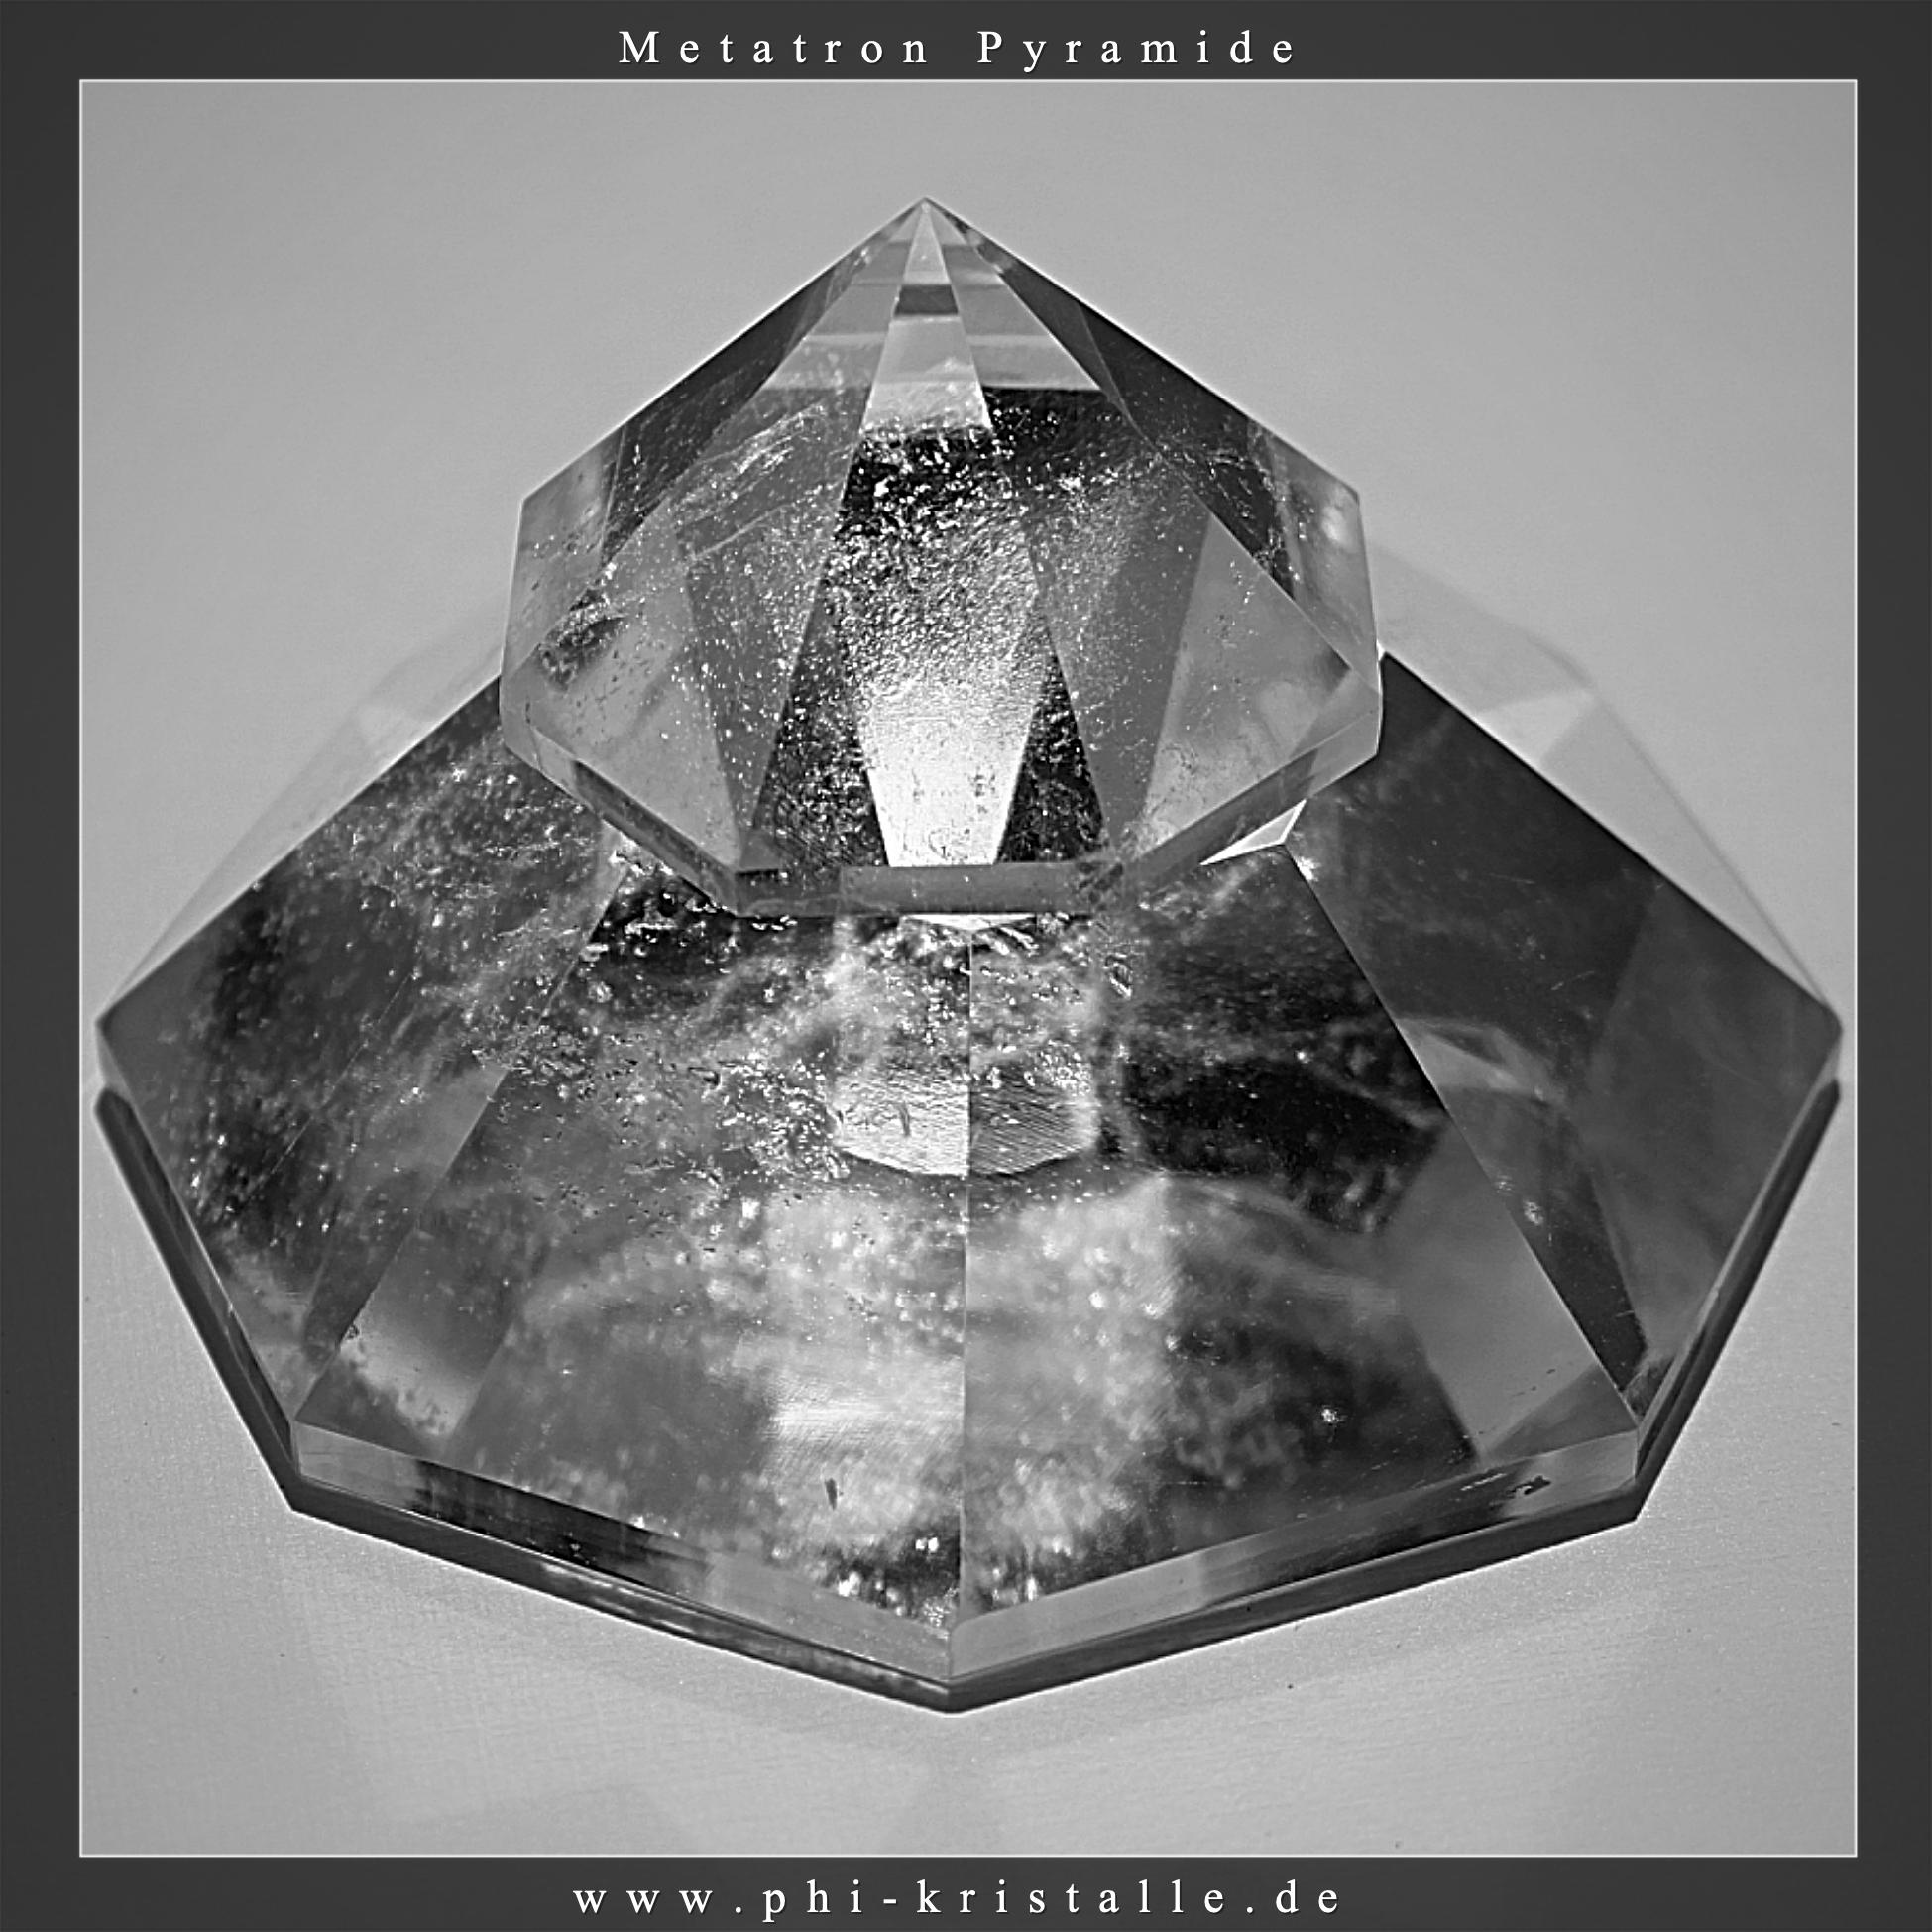 Metatron Pyramide